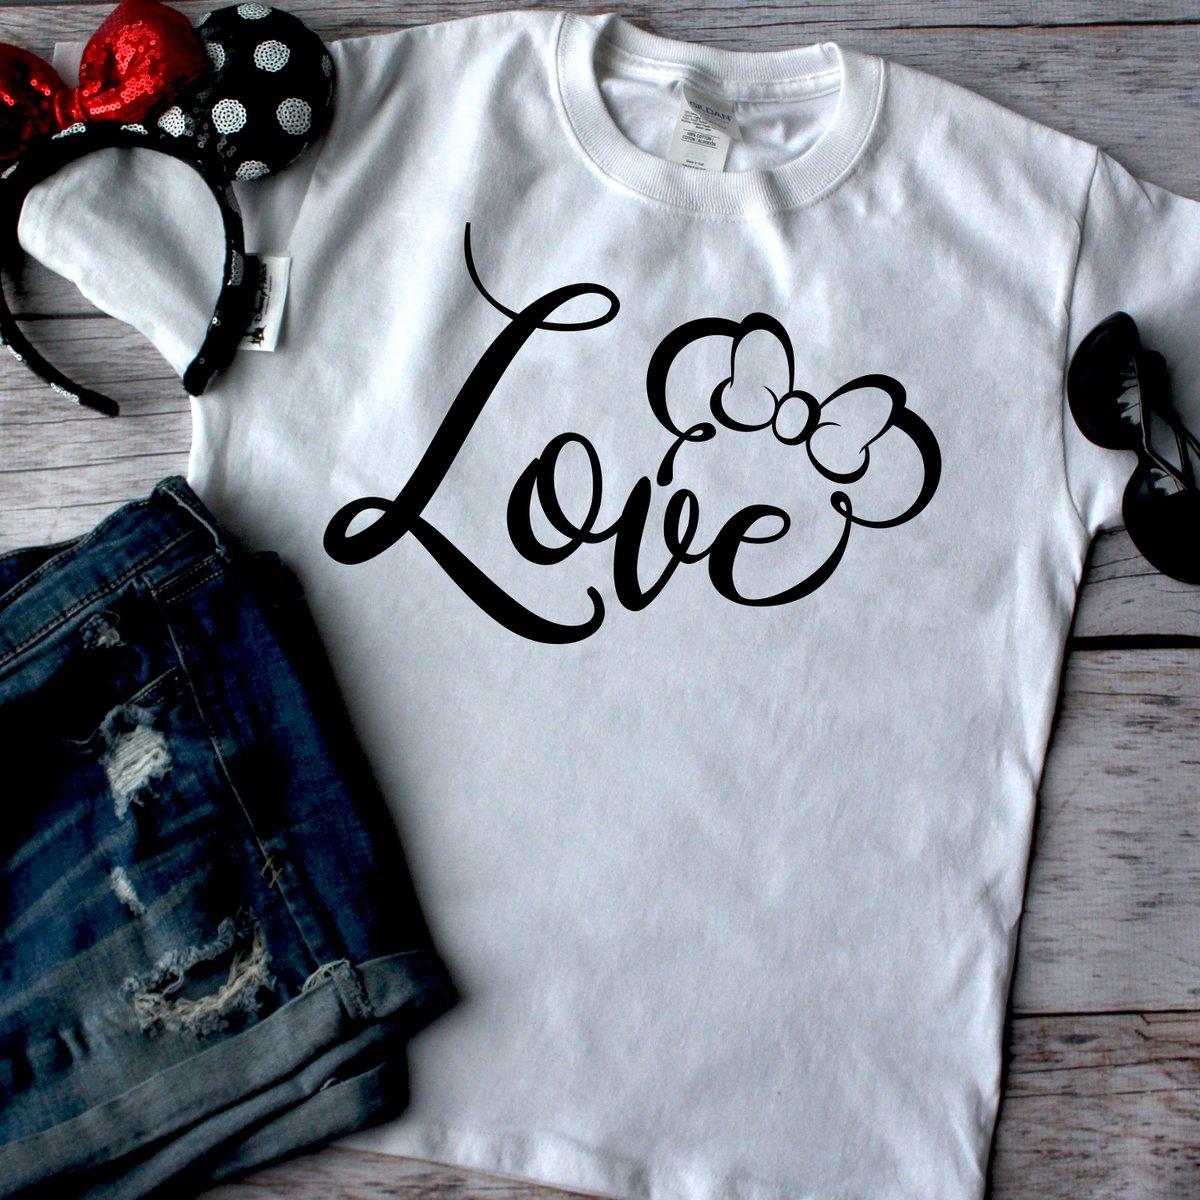 Family vacation shirt,Disney shirt,Disney Vacation Shirt,Minnie Mouse Vacation shirt,Matching shirts,Matching vacation shirt,Love,Minnie  #disneyears #toystoryears